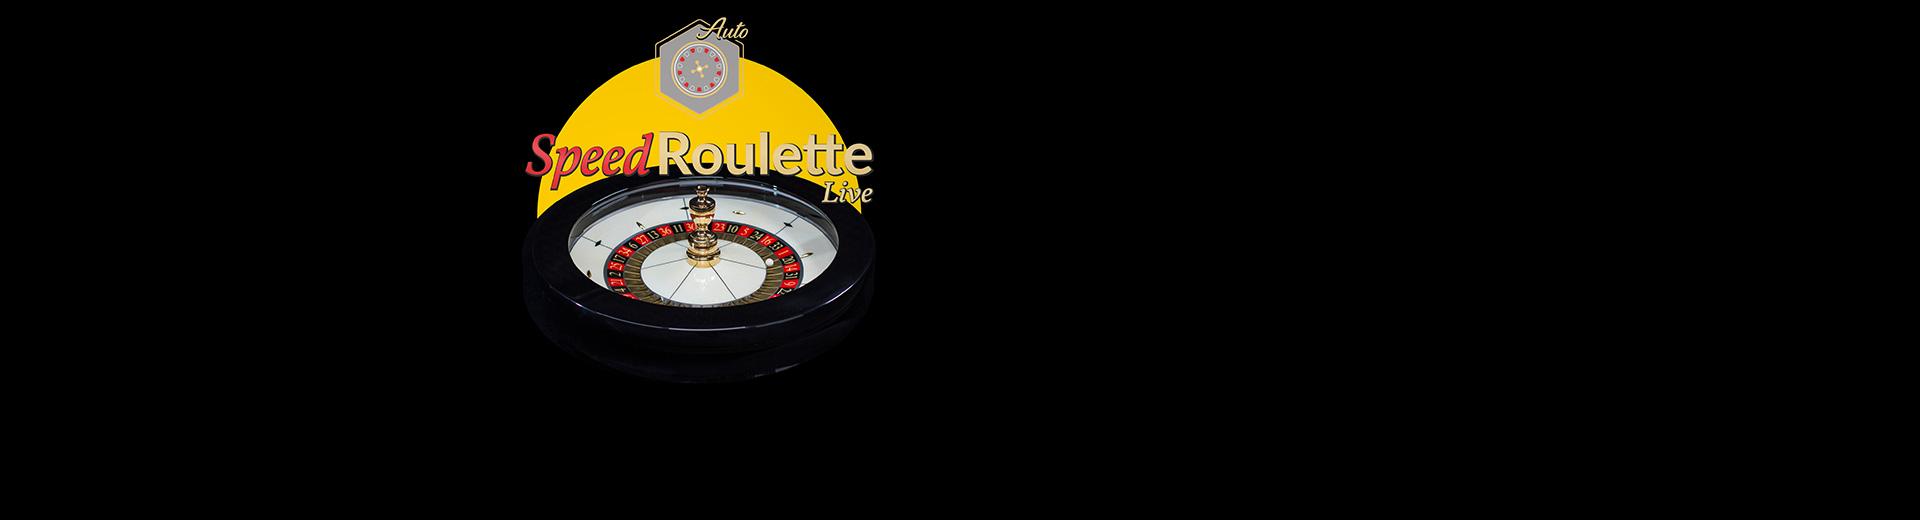 C10-1920x520_2338_2018_Speed Auto Roulette_Evolution